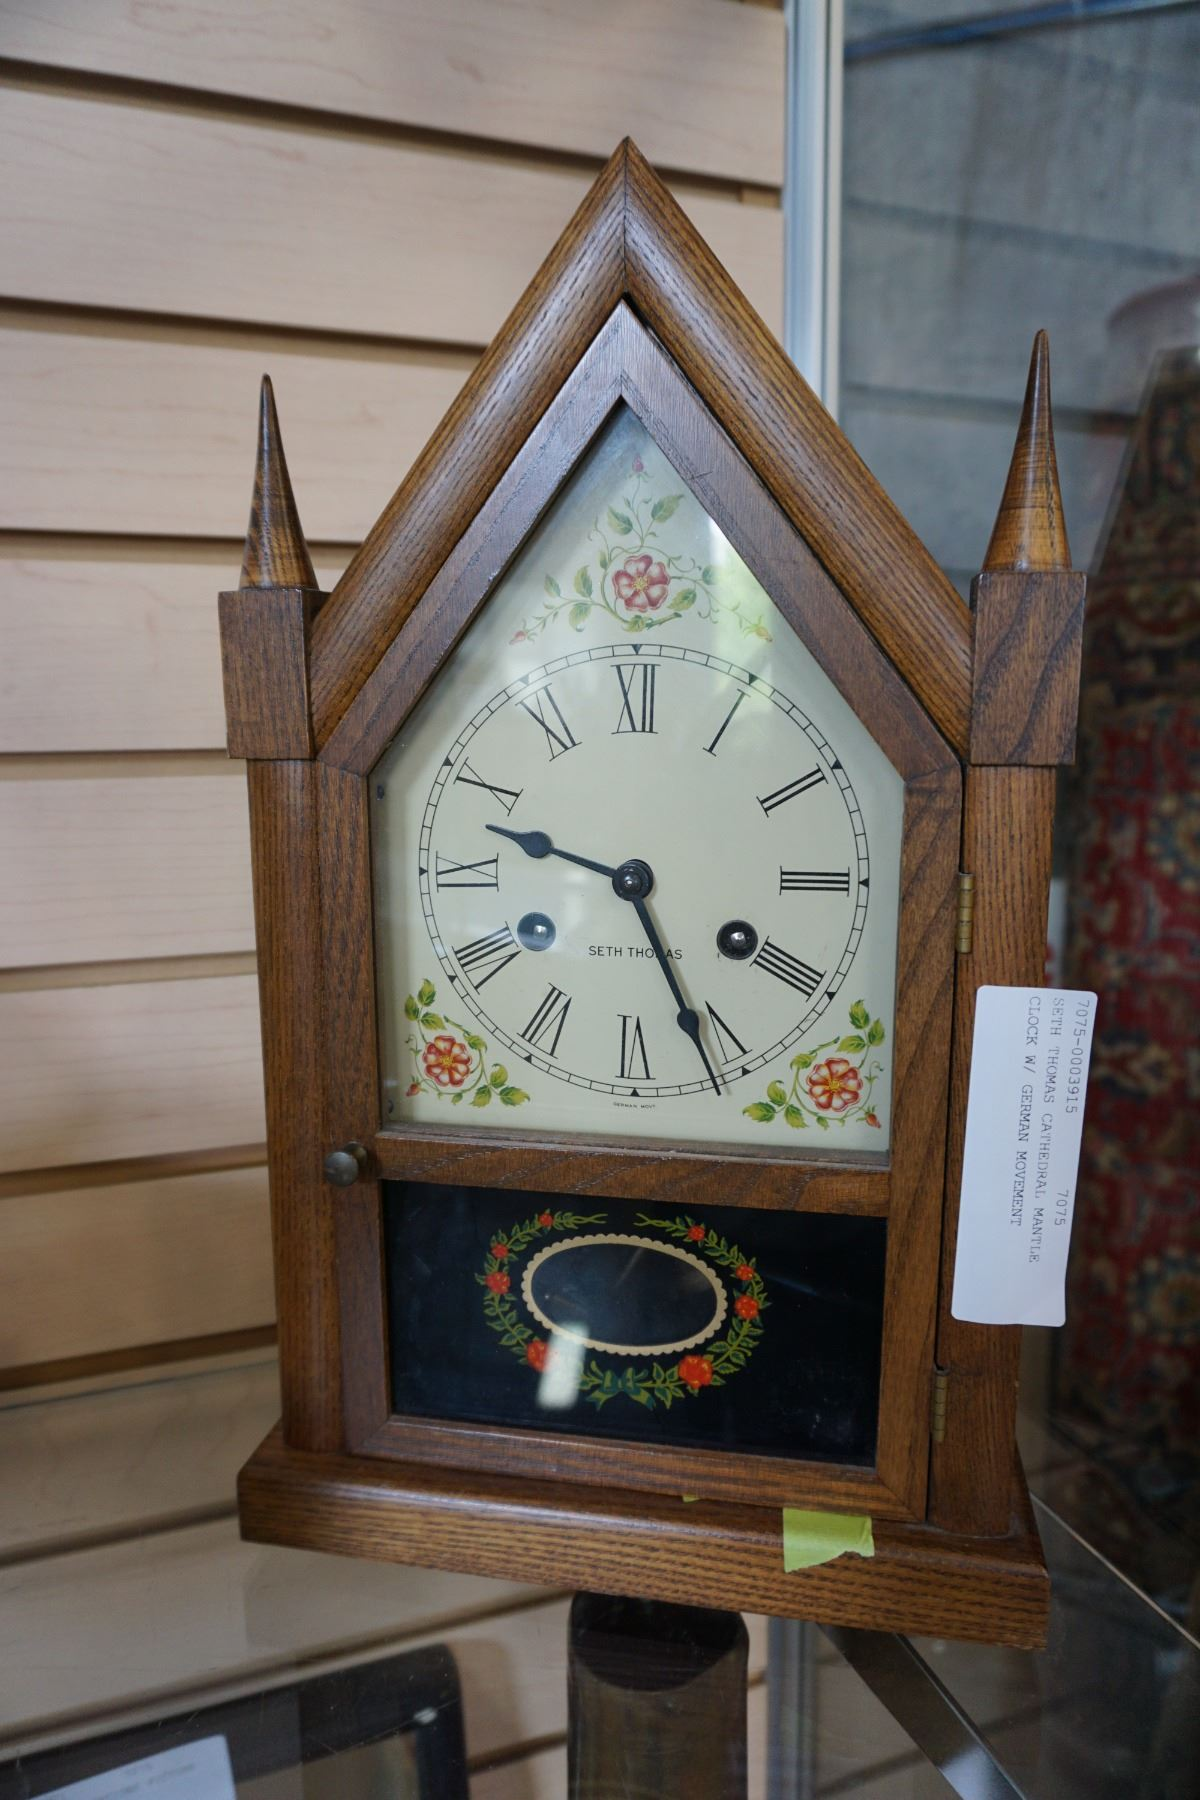 SETH THOMAS CATHEDRAL MANTLE CLOCK W/ GERMAN MOVEMENT